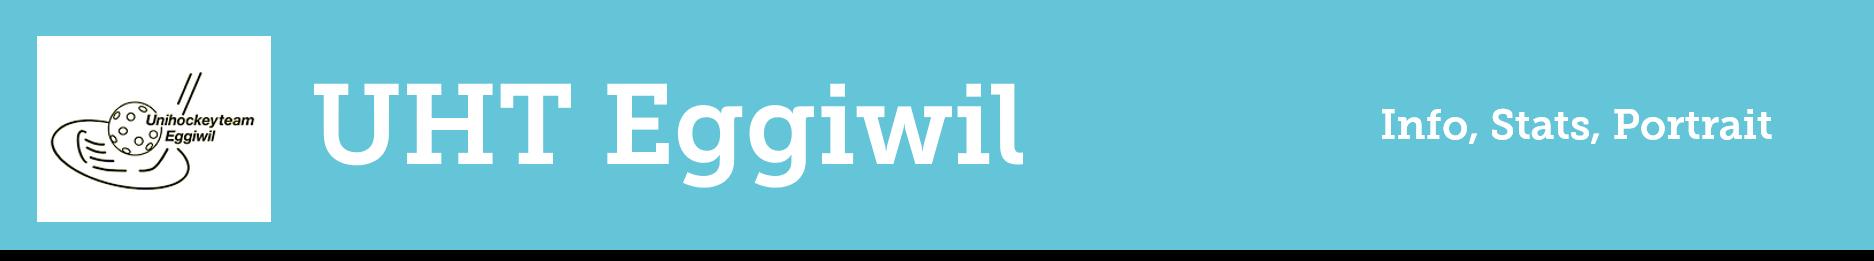 eggiwil.png